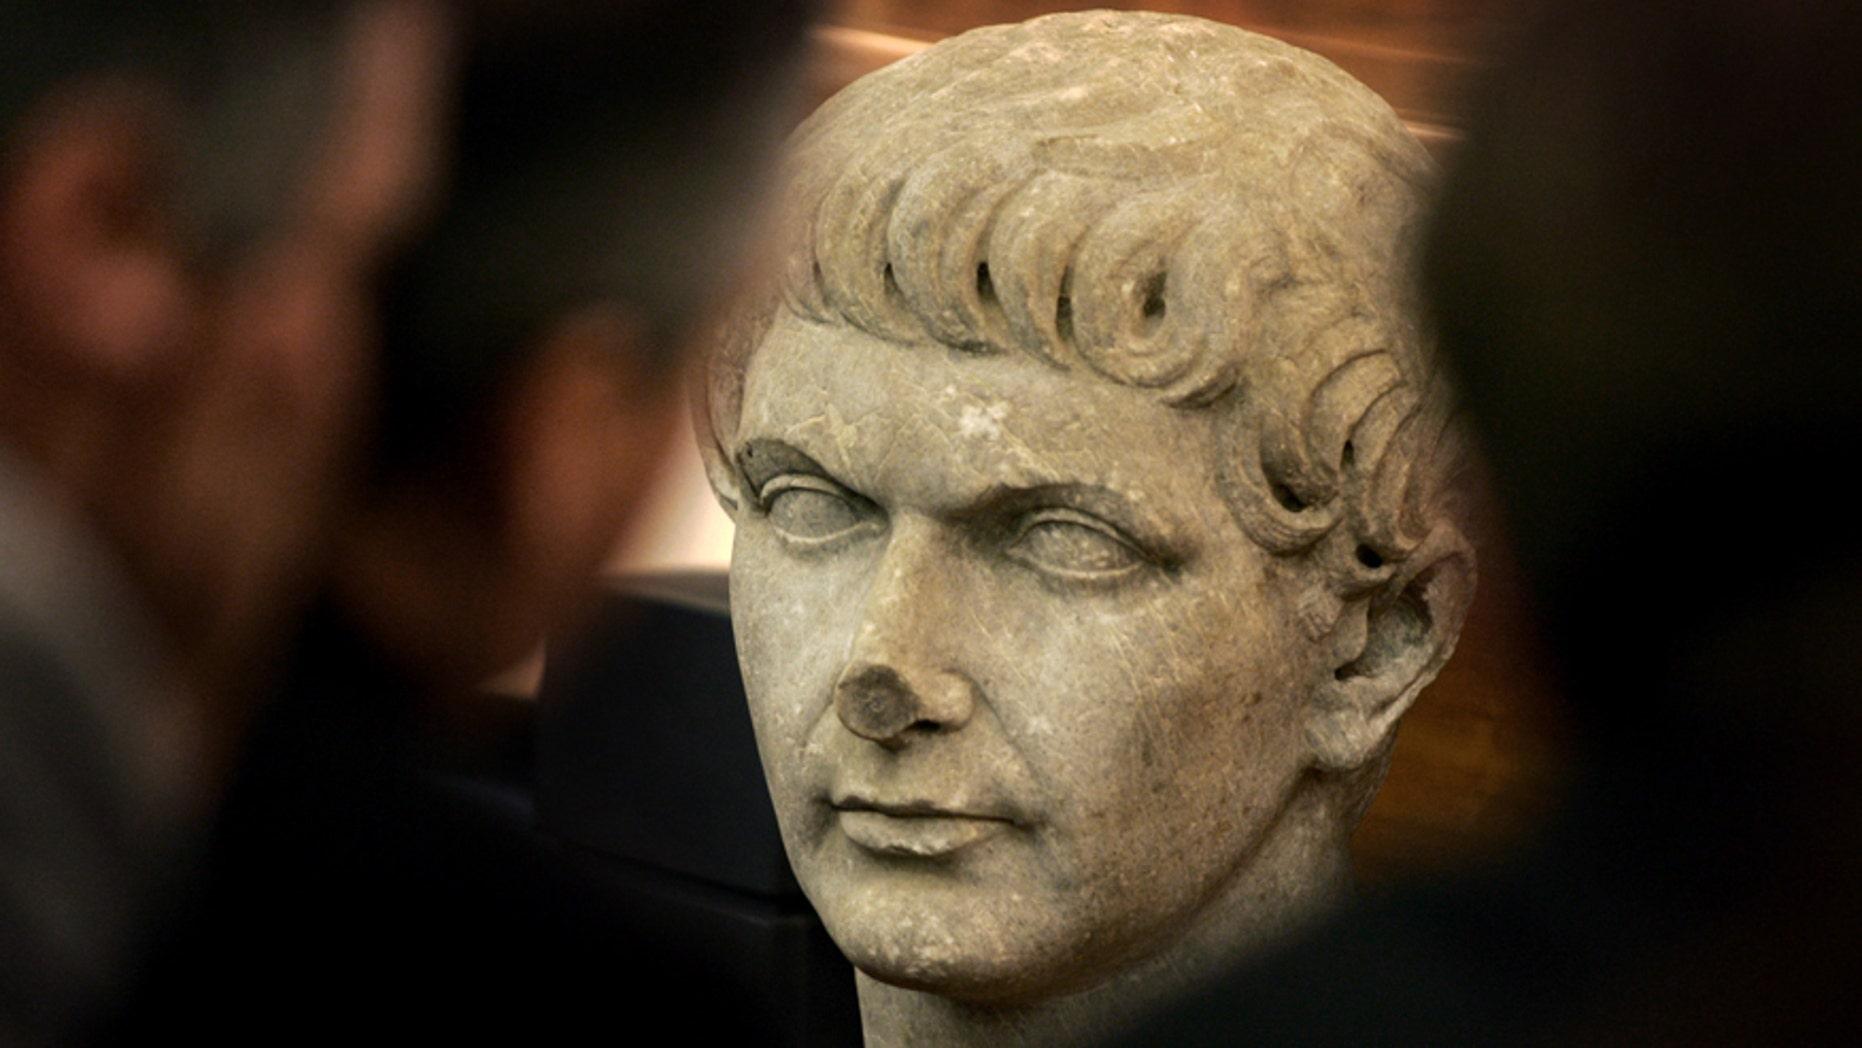 File photo of marble head statue representing Roman emperor Trajan.